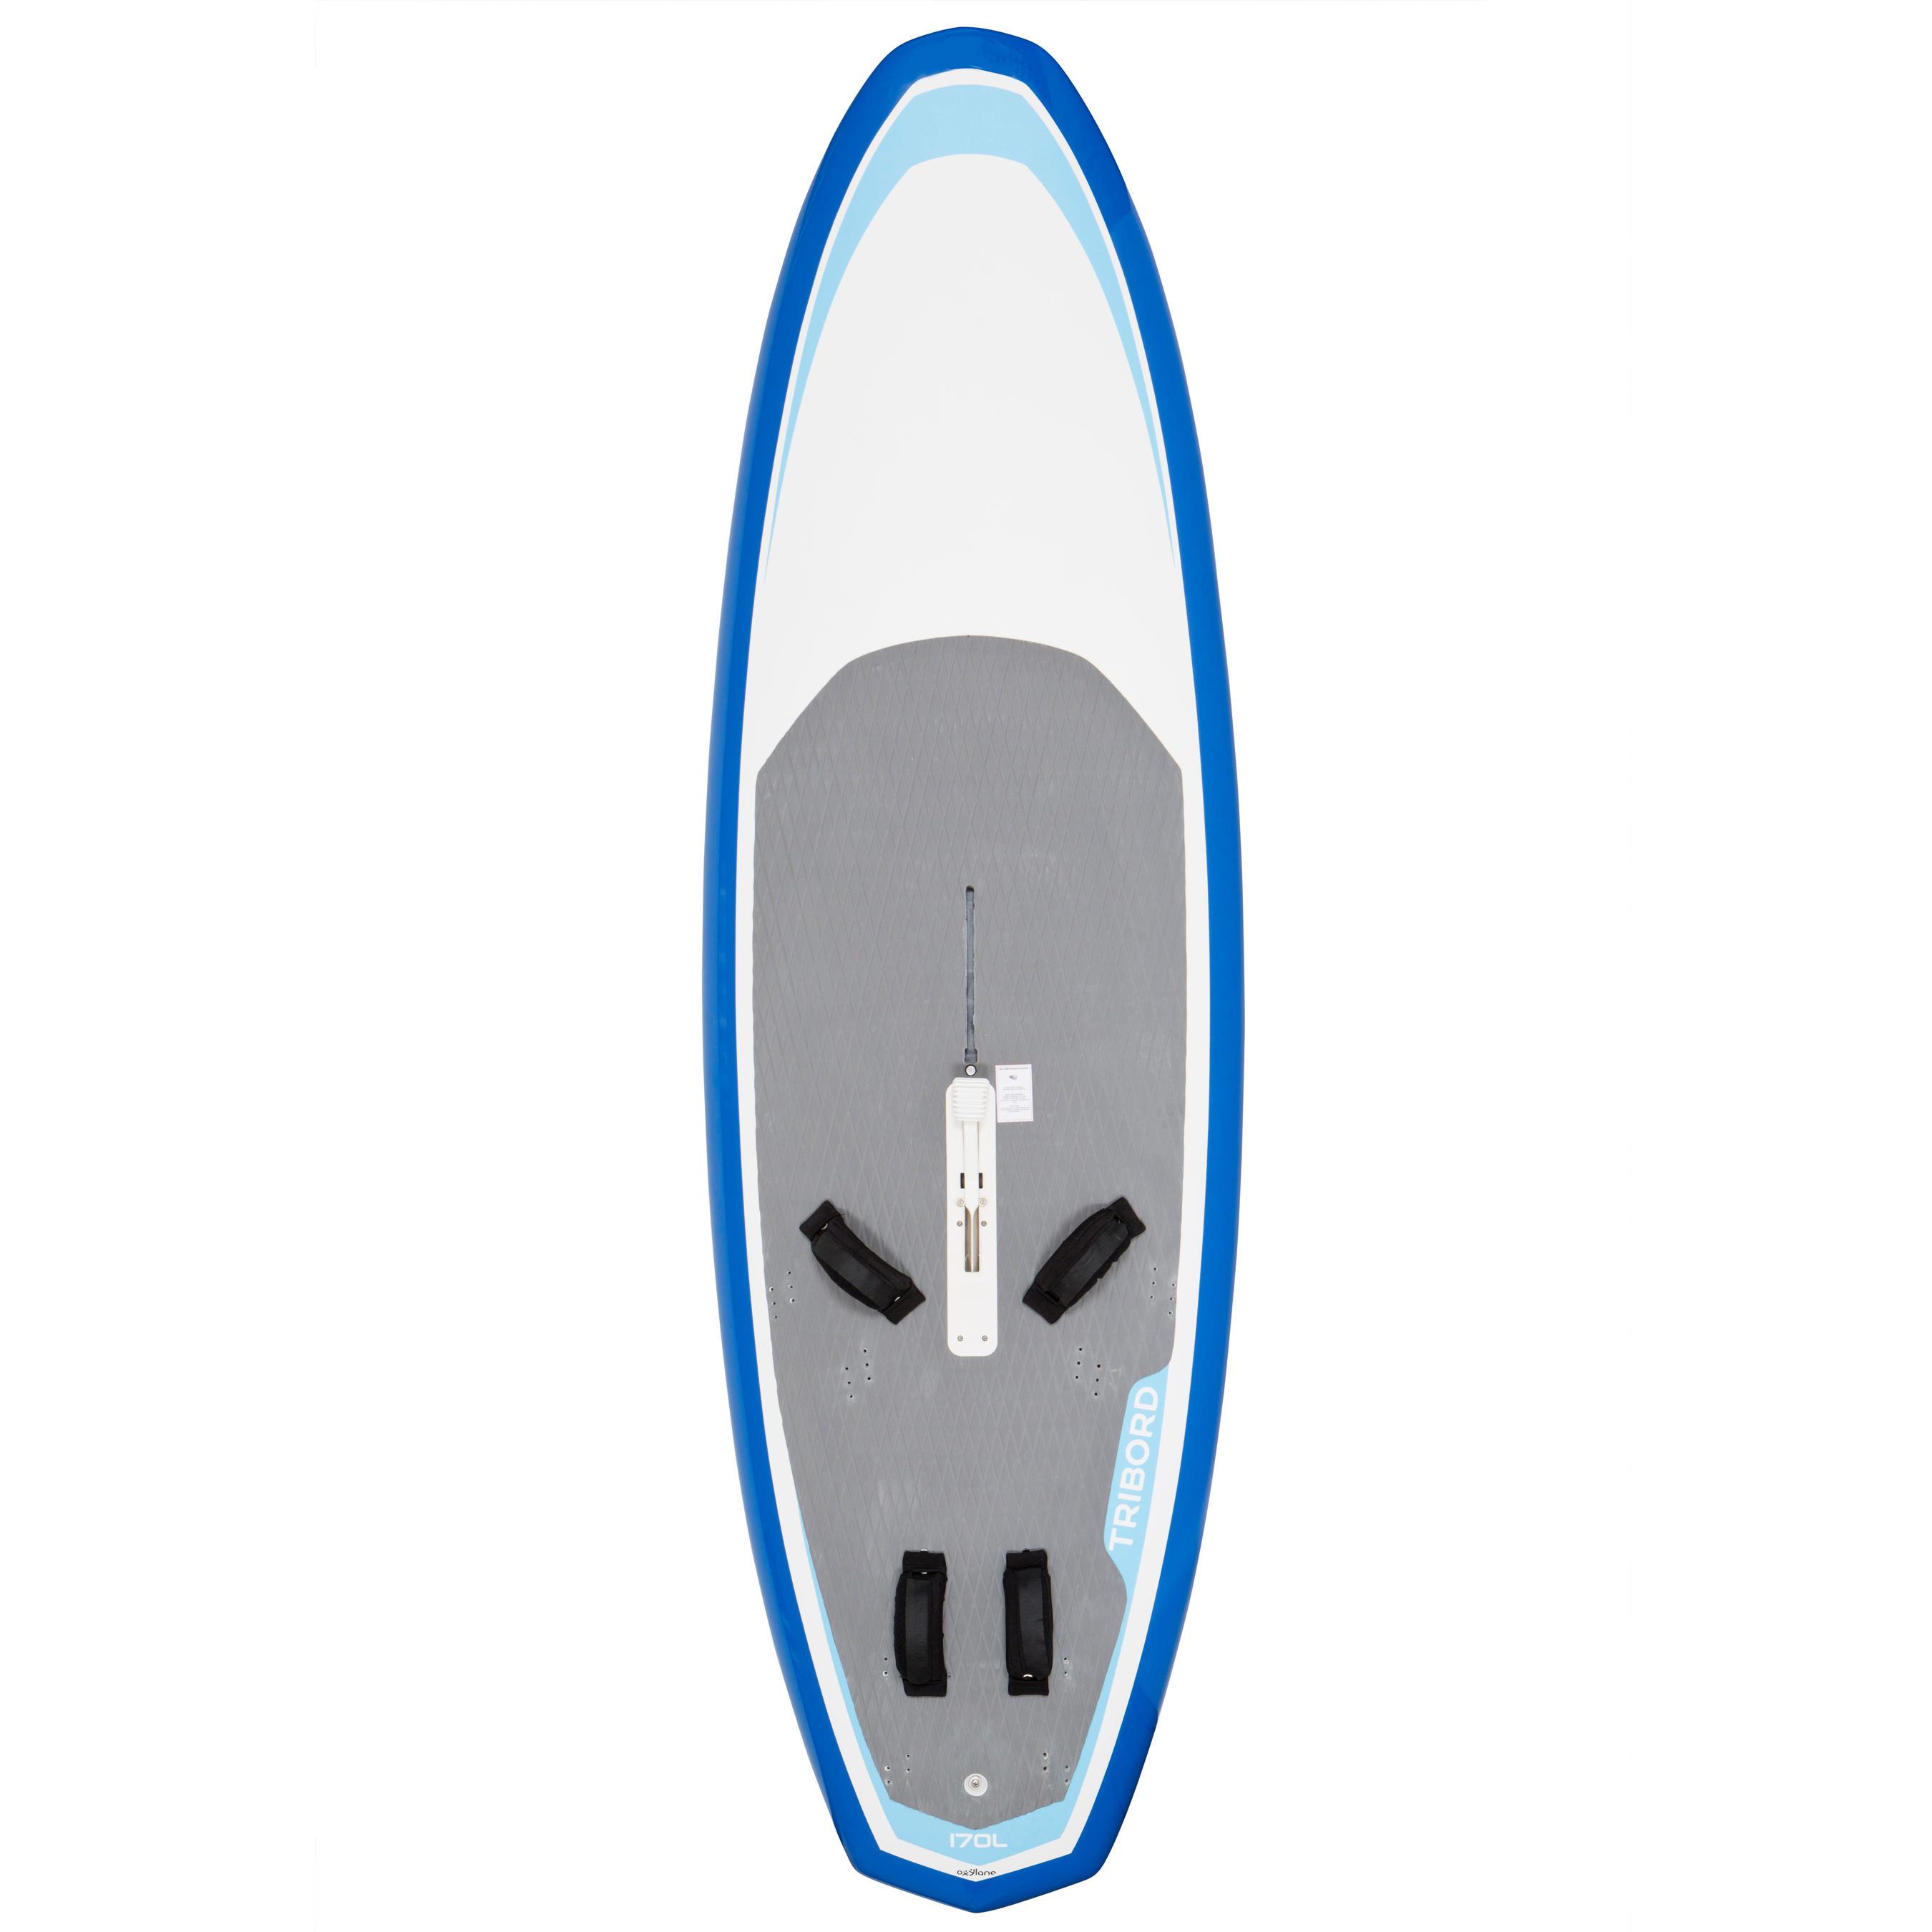 Tribord Stijve windsurfplank 170 l met zwaard en footstraps